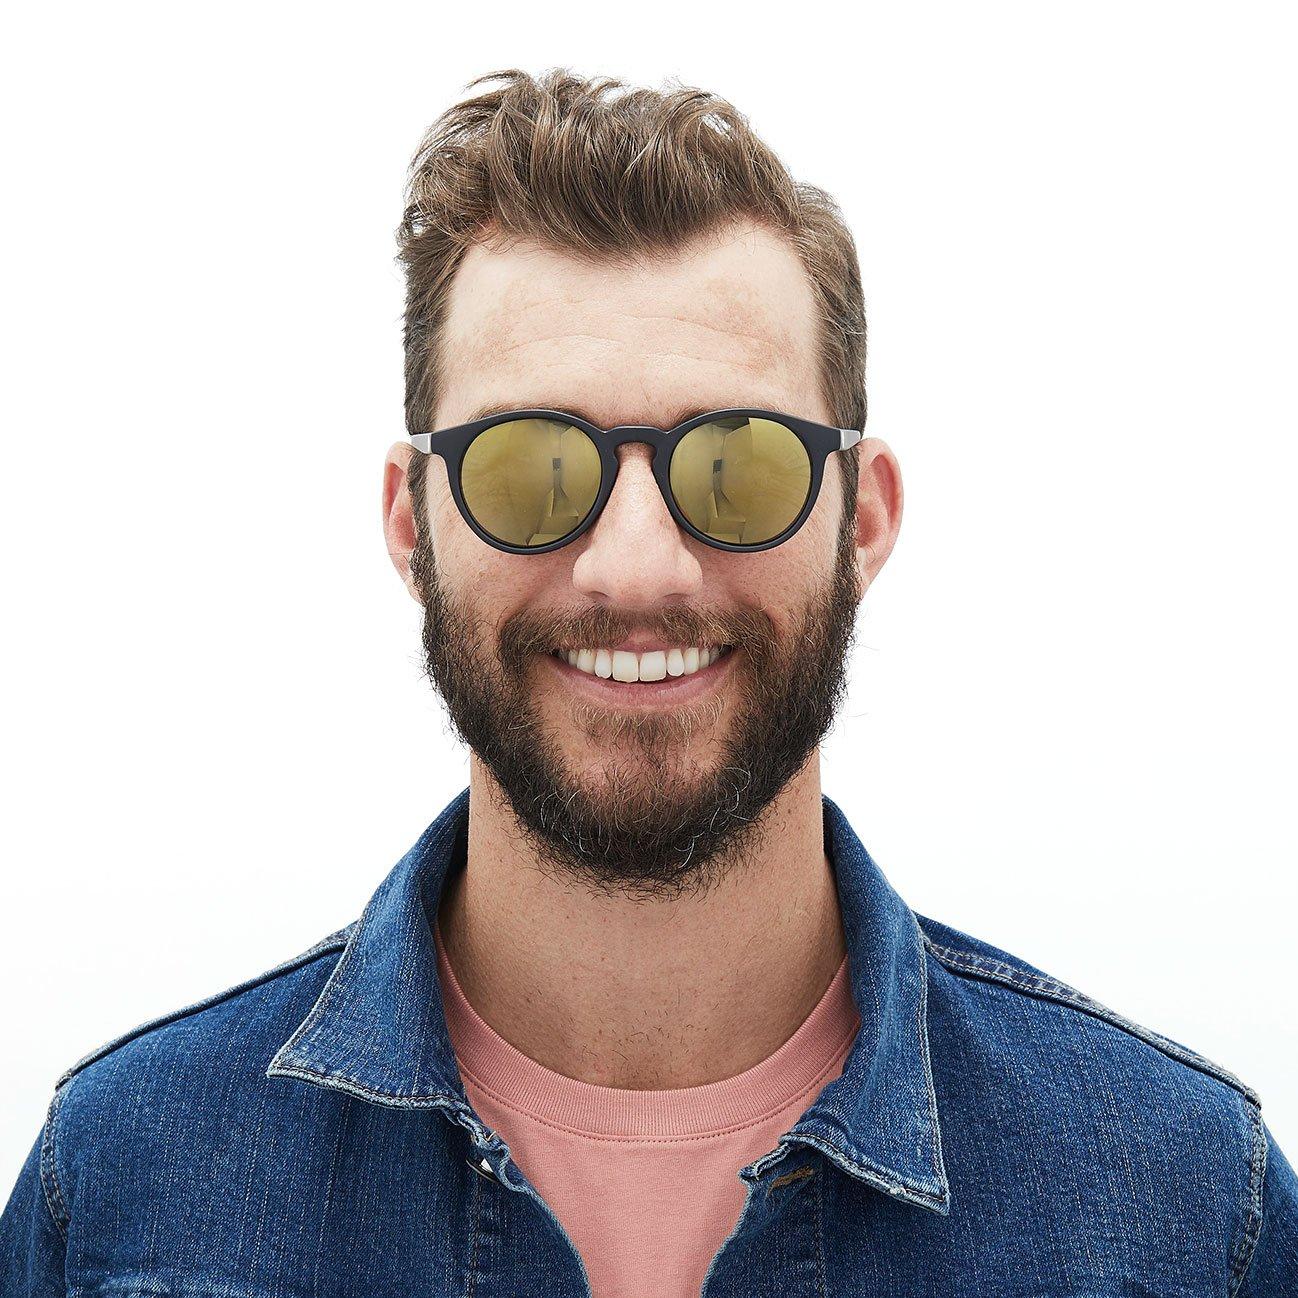 b71426cbf4667 Amazon.com  Sunski Dipseas Polarized Sunglasses for Men and Women   Electronics